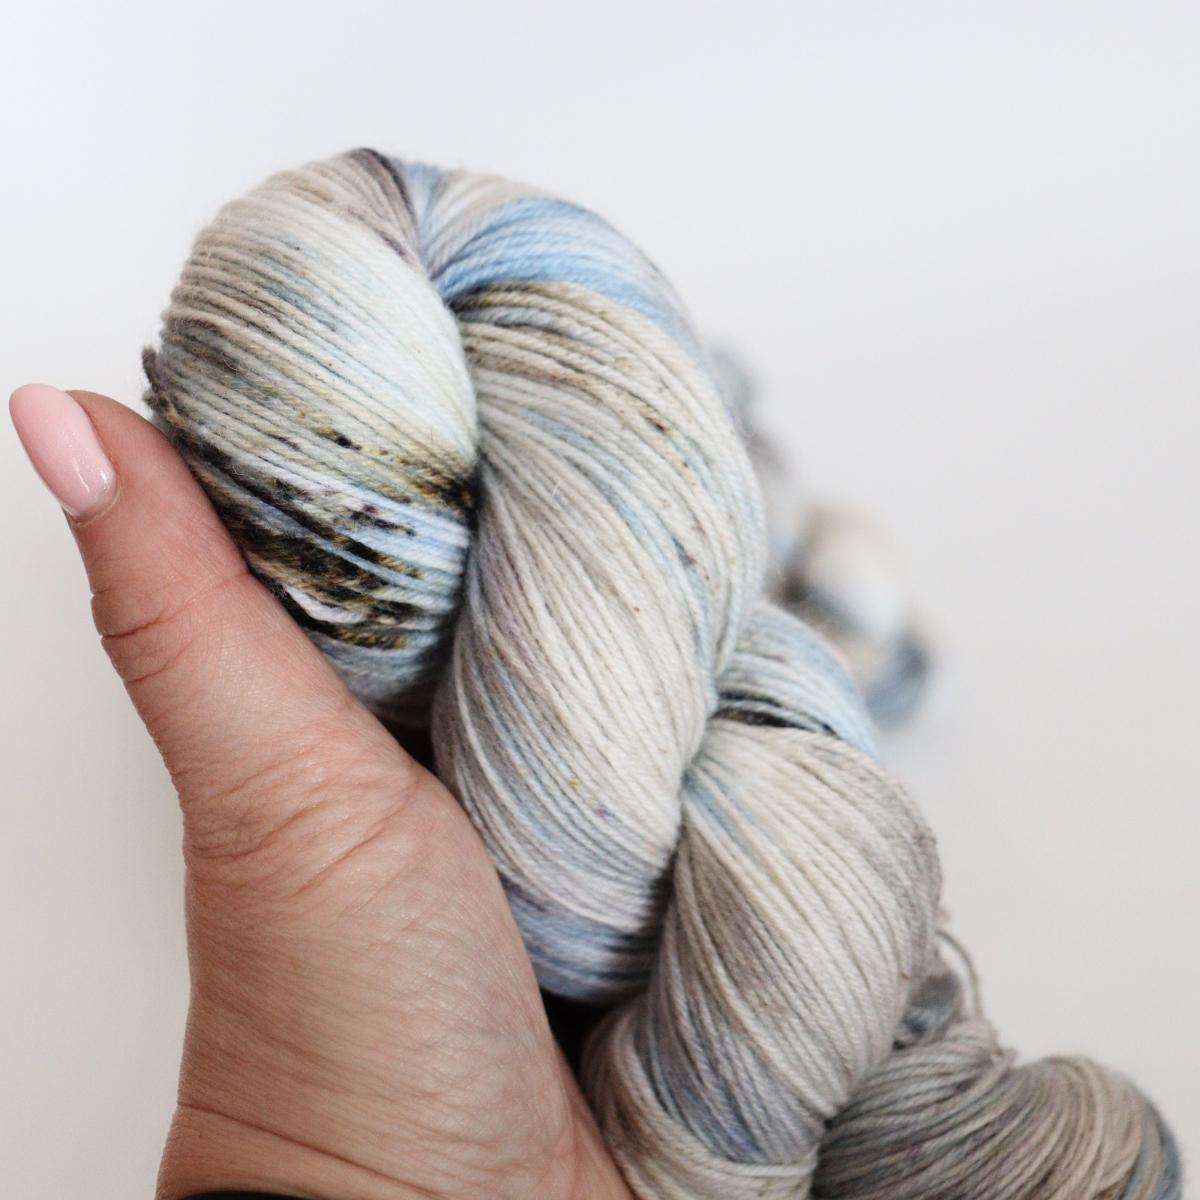 woodico.pro hand dyed yarn 063 1 1200x1200 - Hand dyed yarn / 063